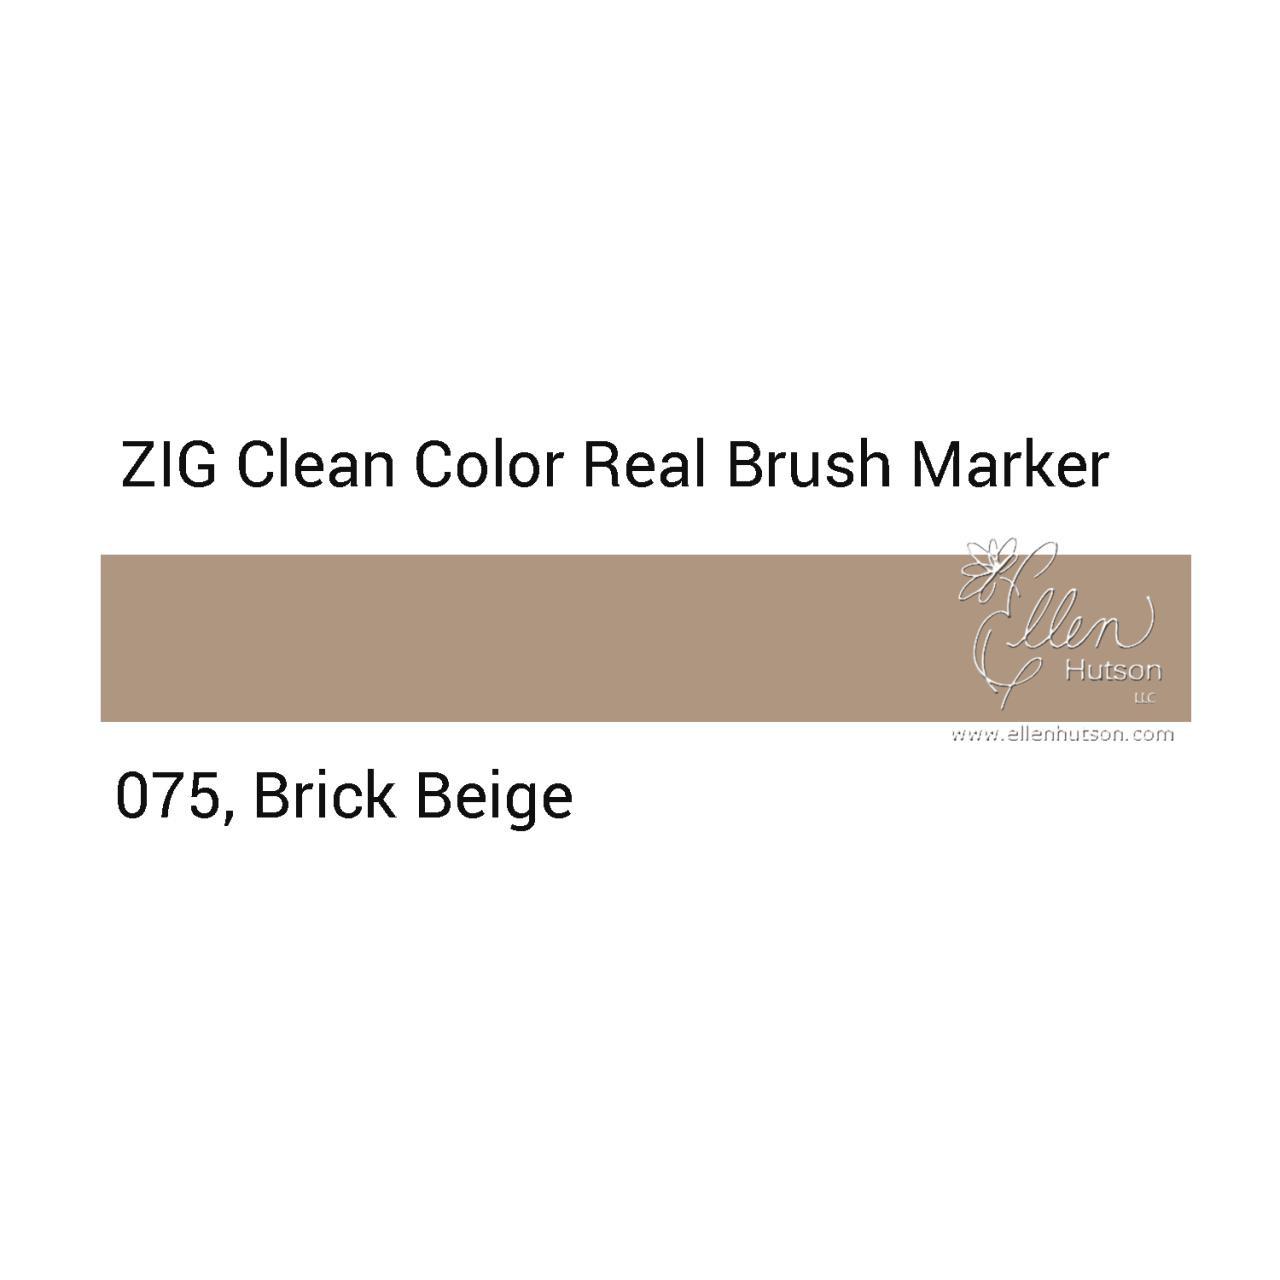 075 - Brick Beige, ZIG Clean Color Real Brush Marker -